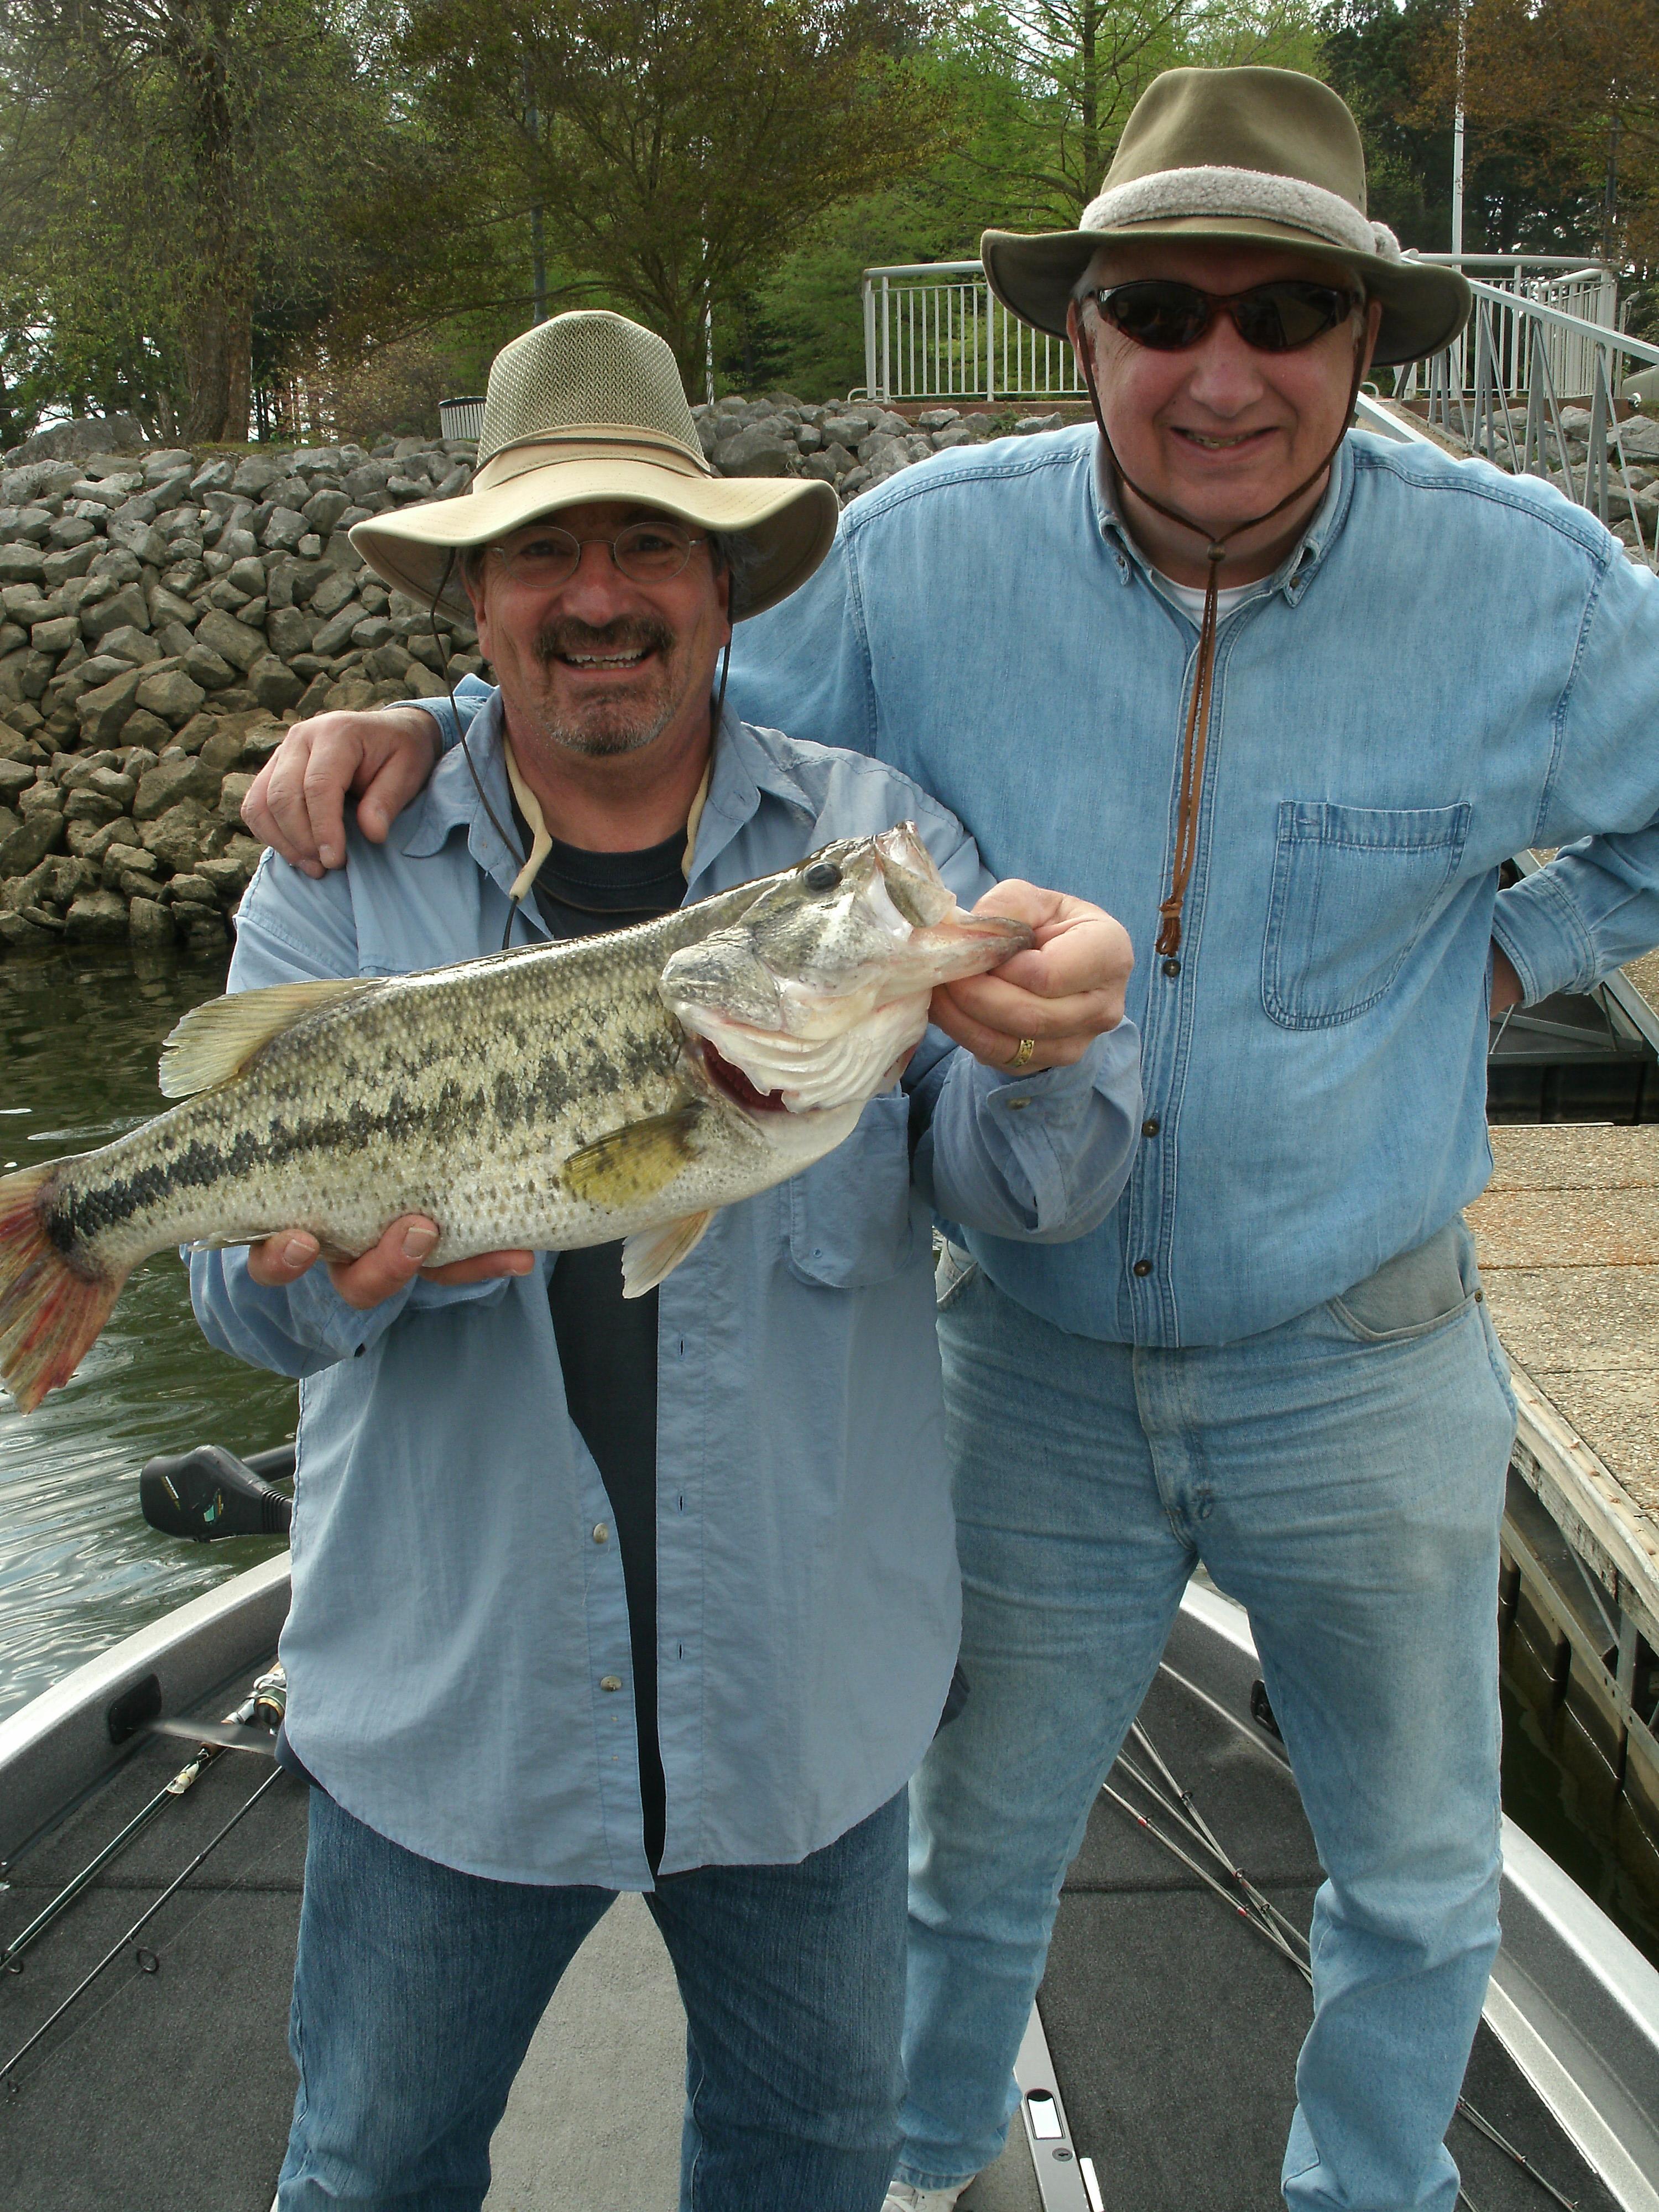 Trophy bass anglers five big bass lures for fishing for Bass fishing season